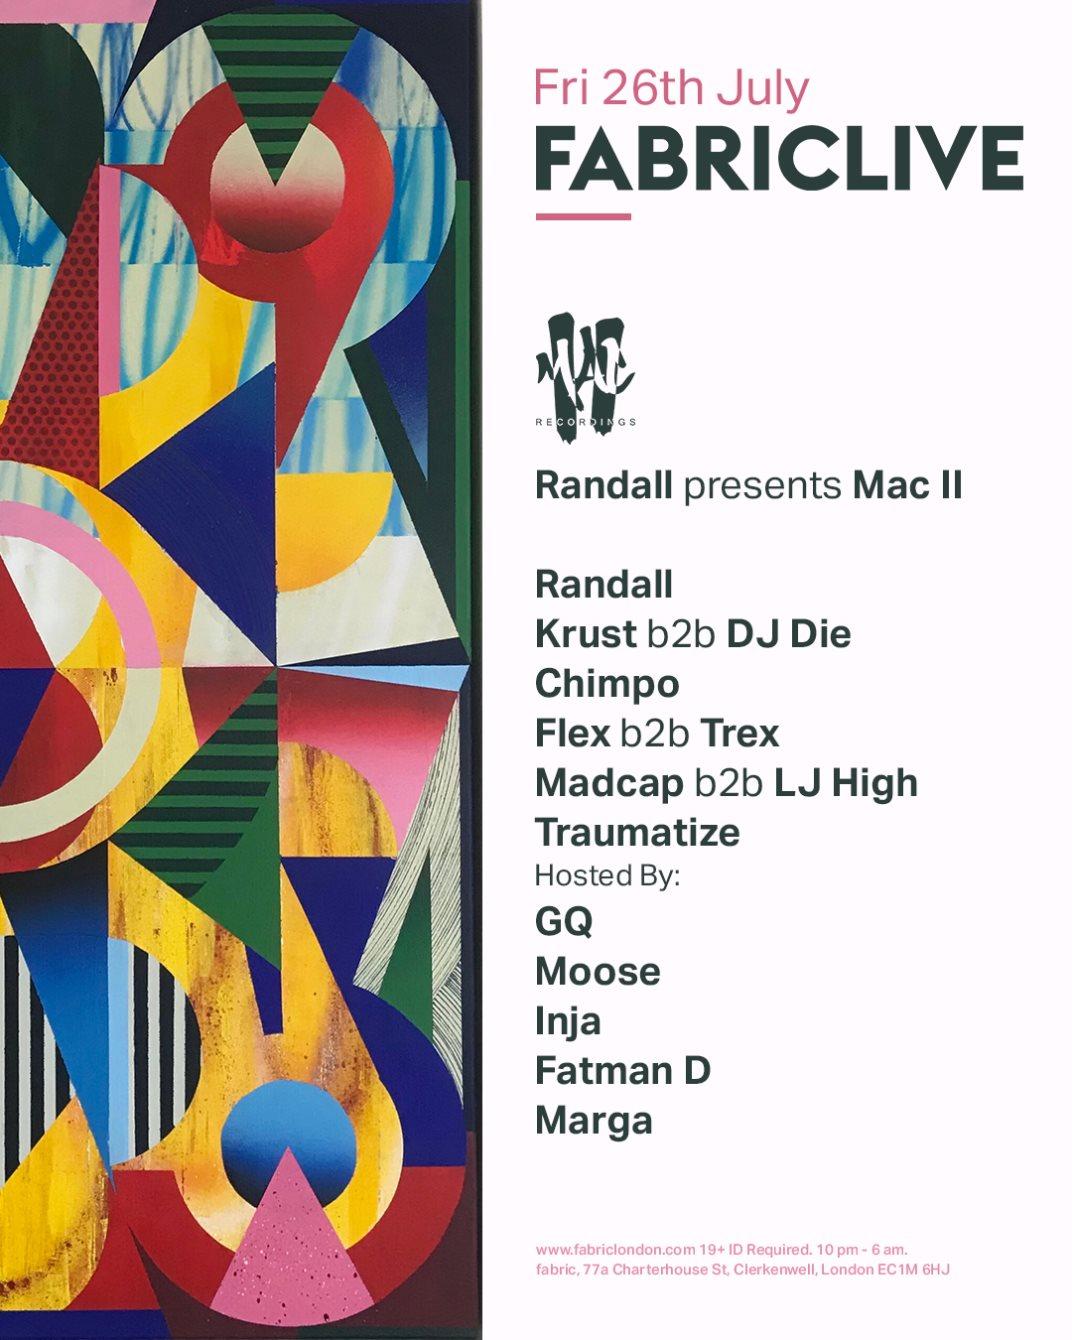 FABRICLIVE x Randall presents Mac II - Flyer back